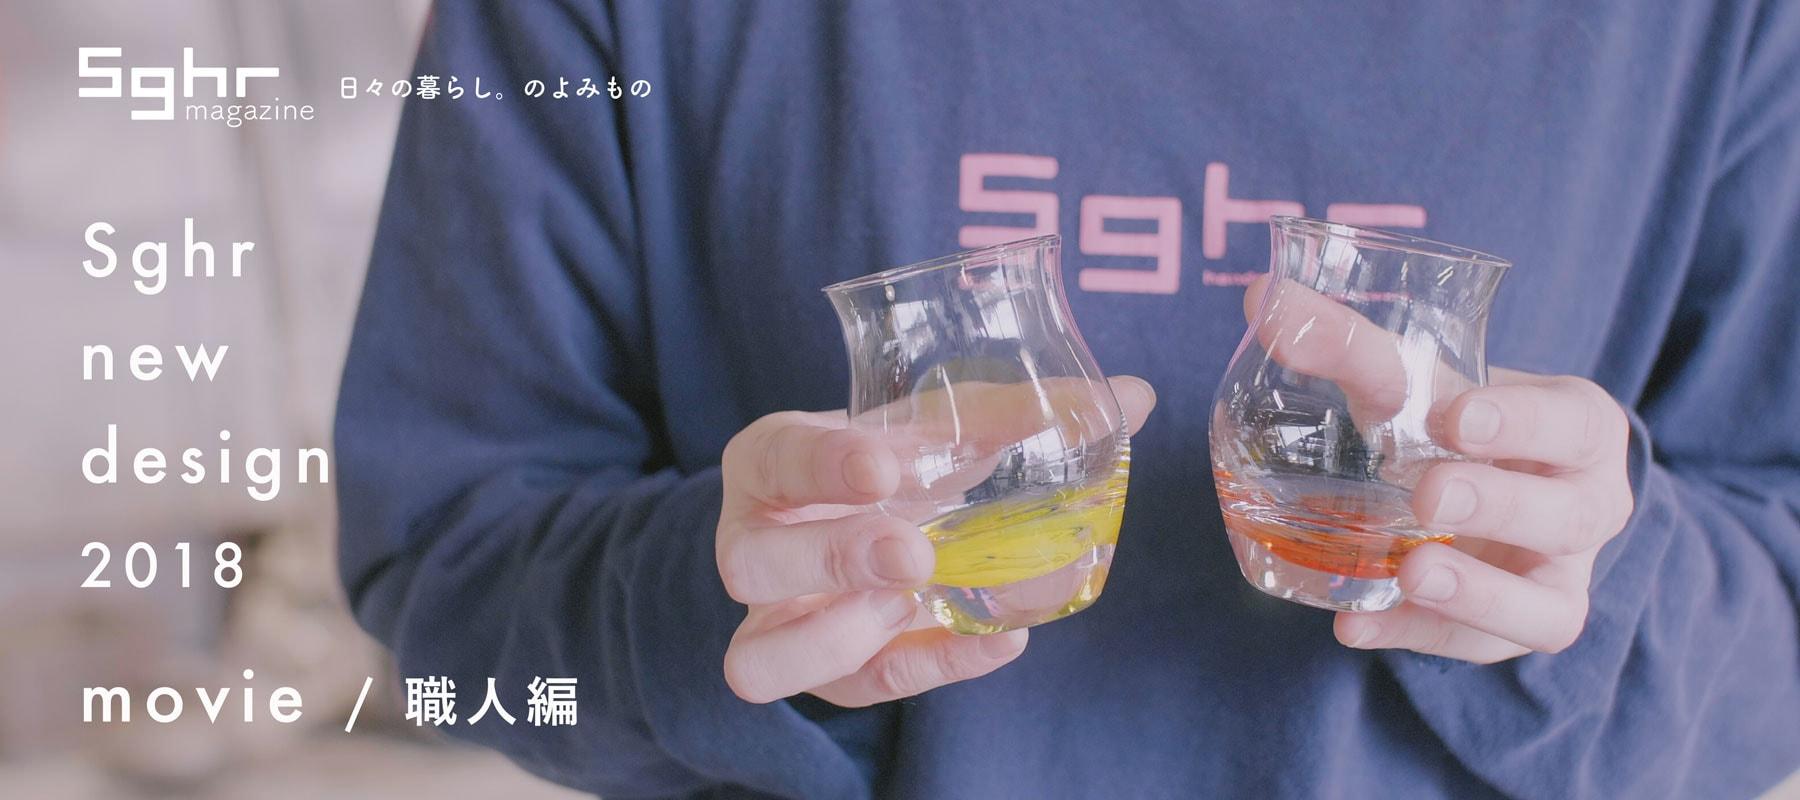 Sghr new design 2018 movie-職人編